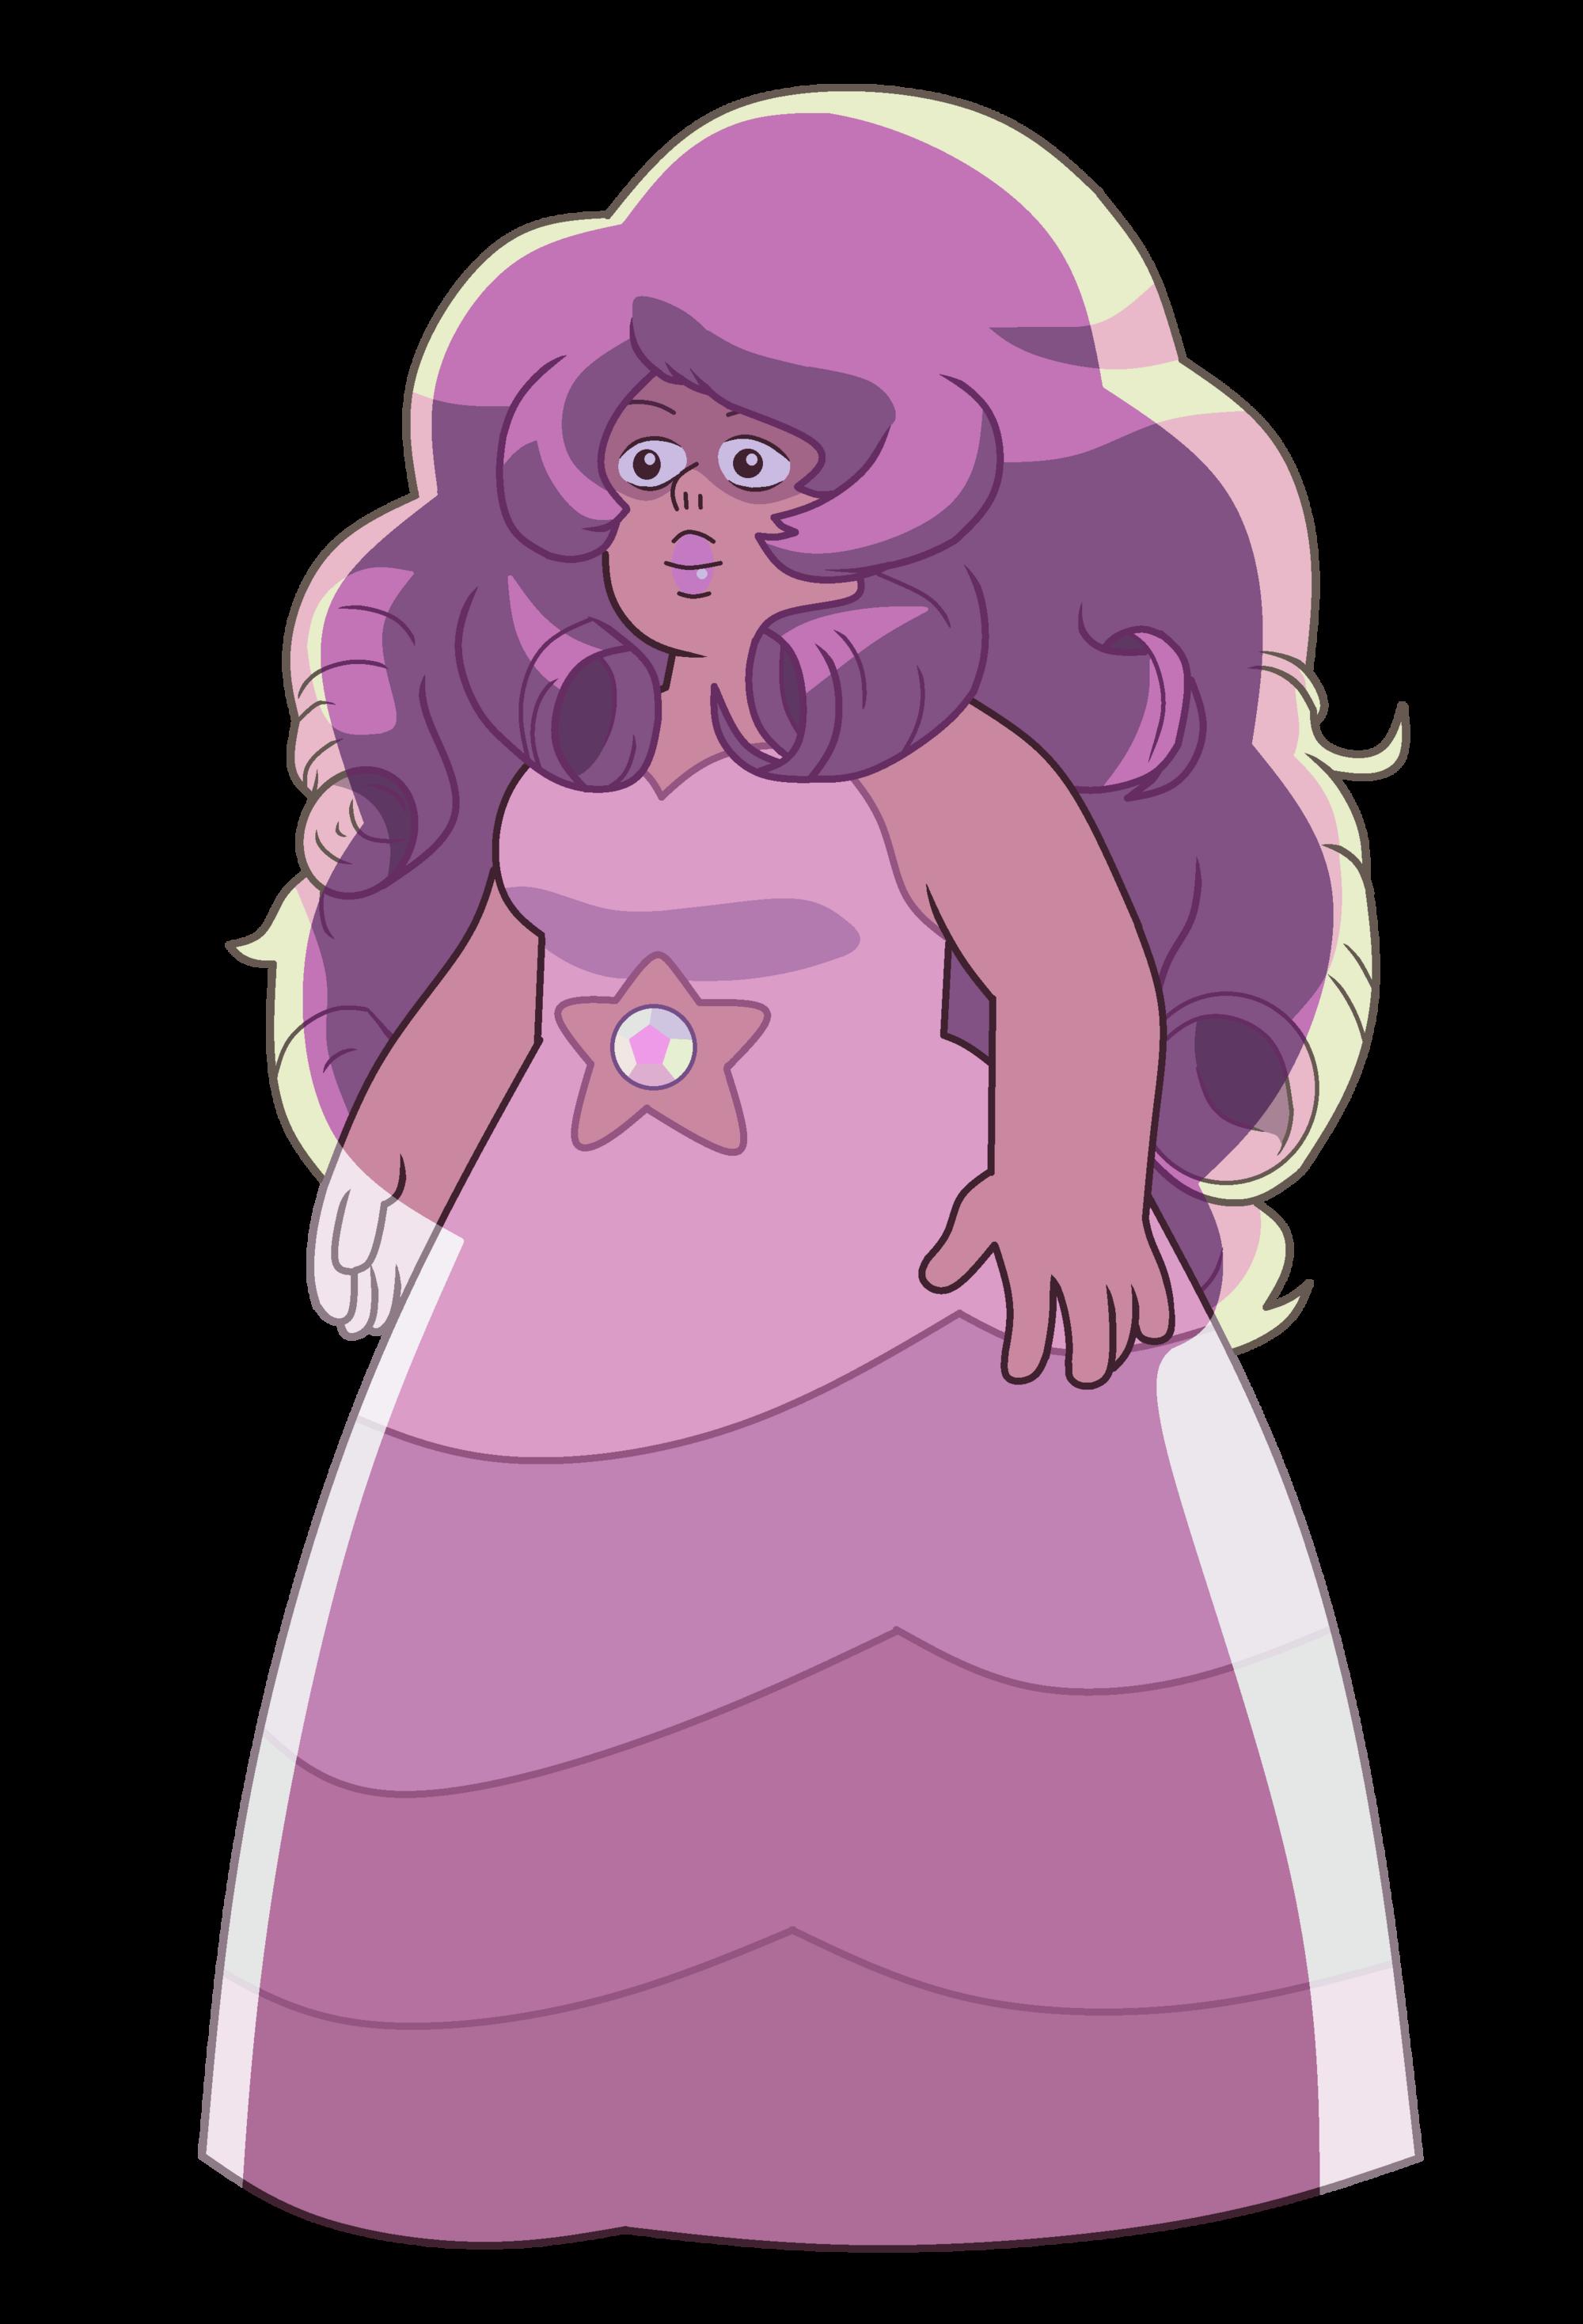 Rose Quartz Steven Universe Hair Template: Image - Rose Quartz - We Need To Talk Party.png